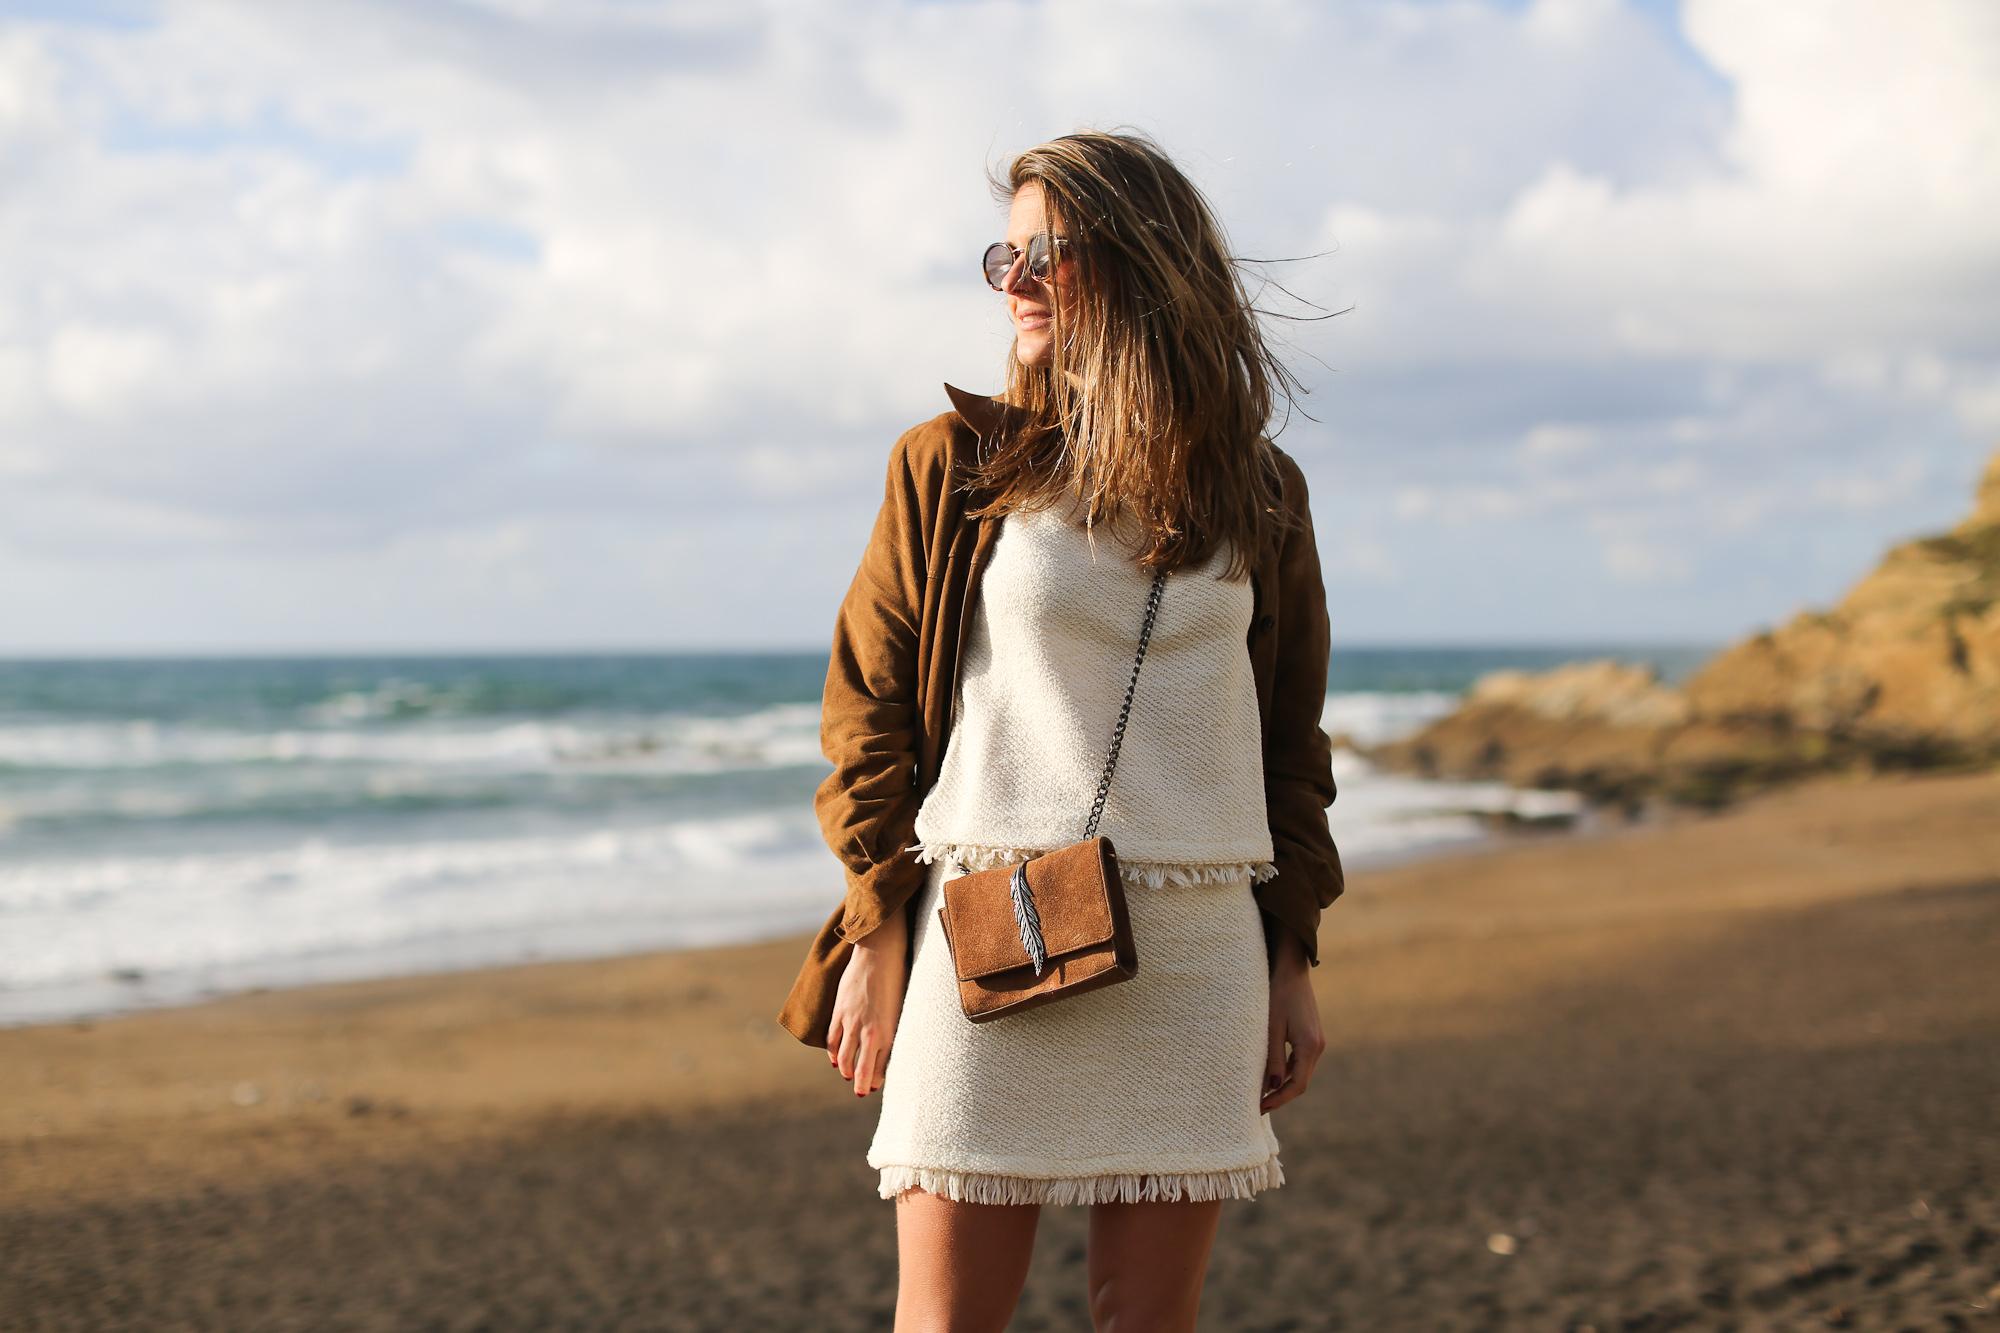 Clochet_streetstyle_blanco_white_tweedskirt_supergagoldrose-3